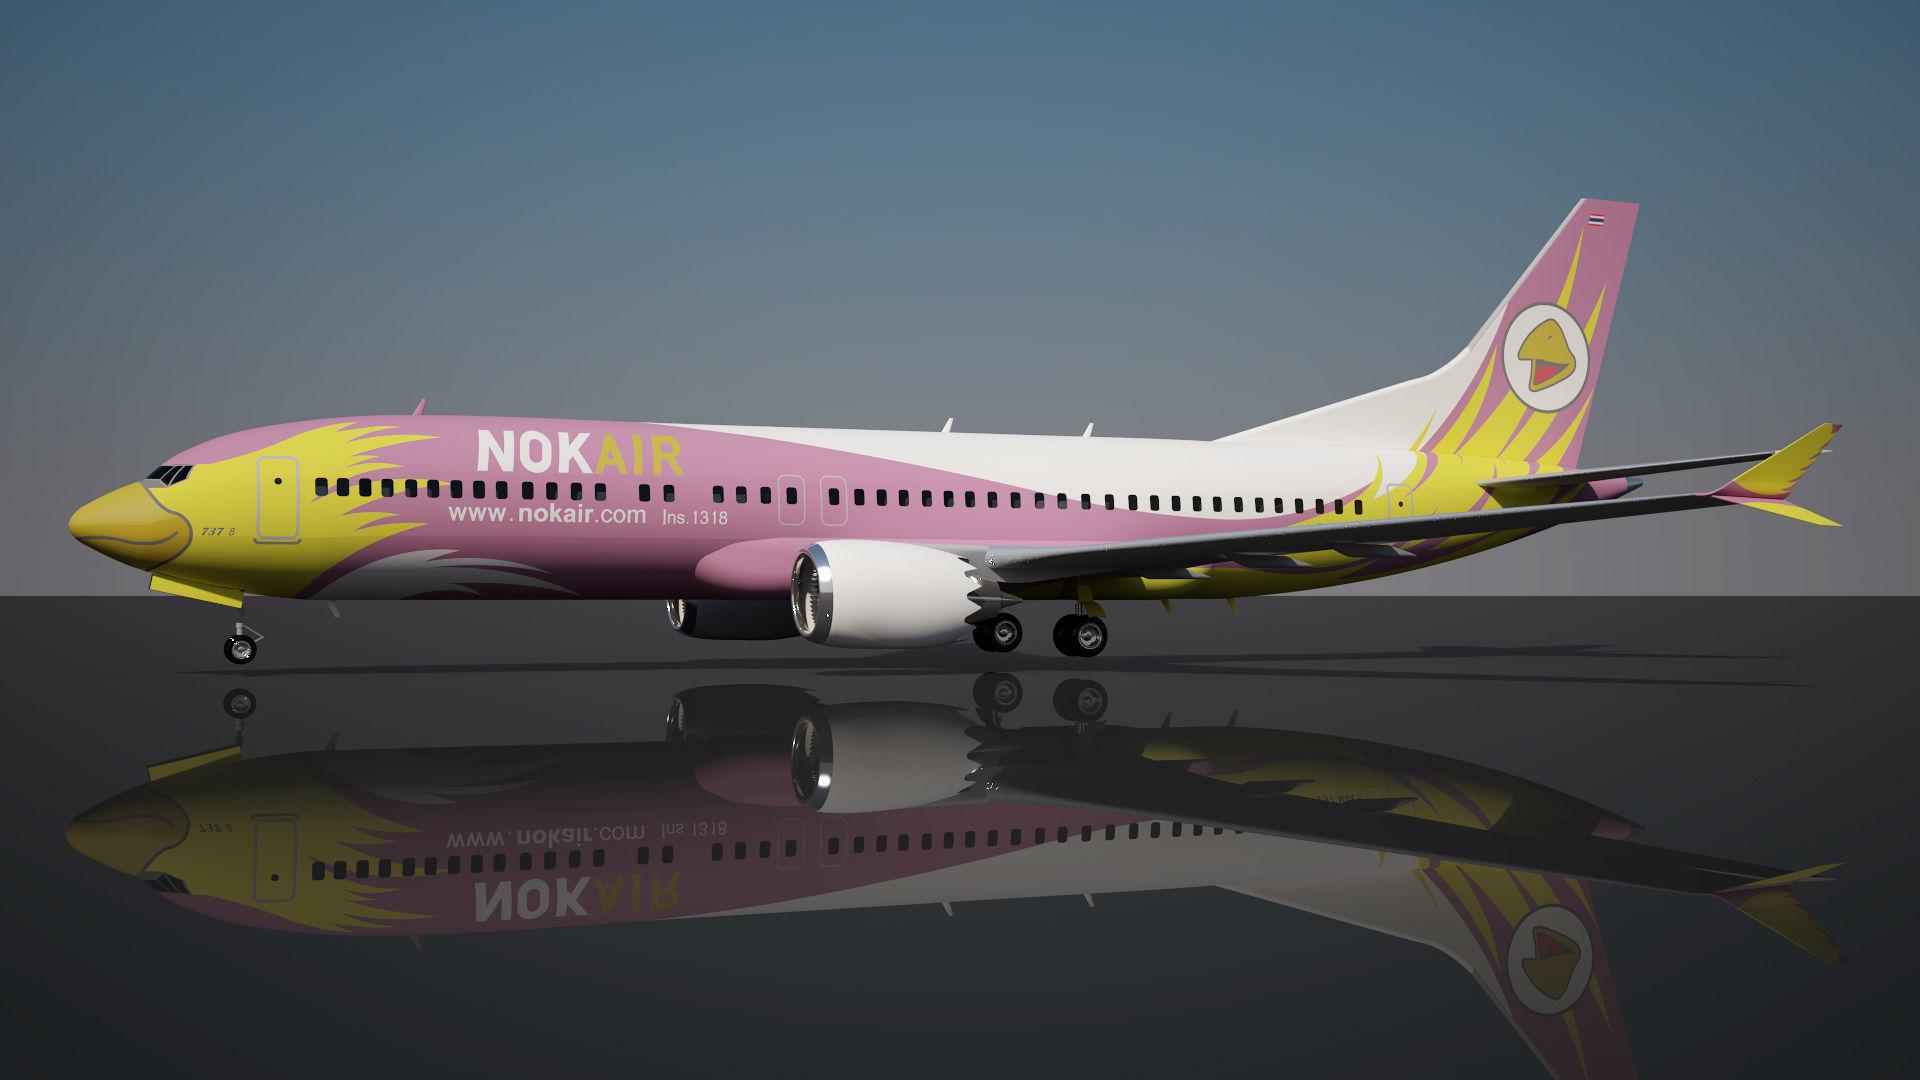 Nok Air Boeing 737 max 8 | 3D model